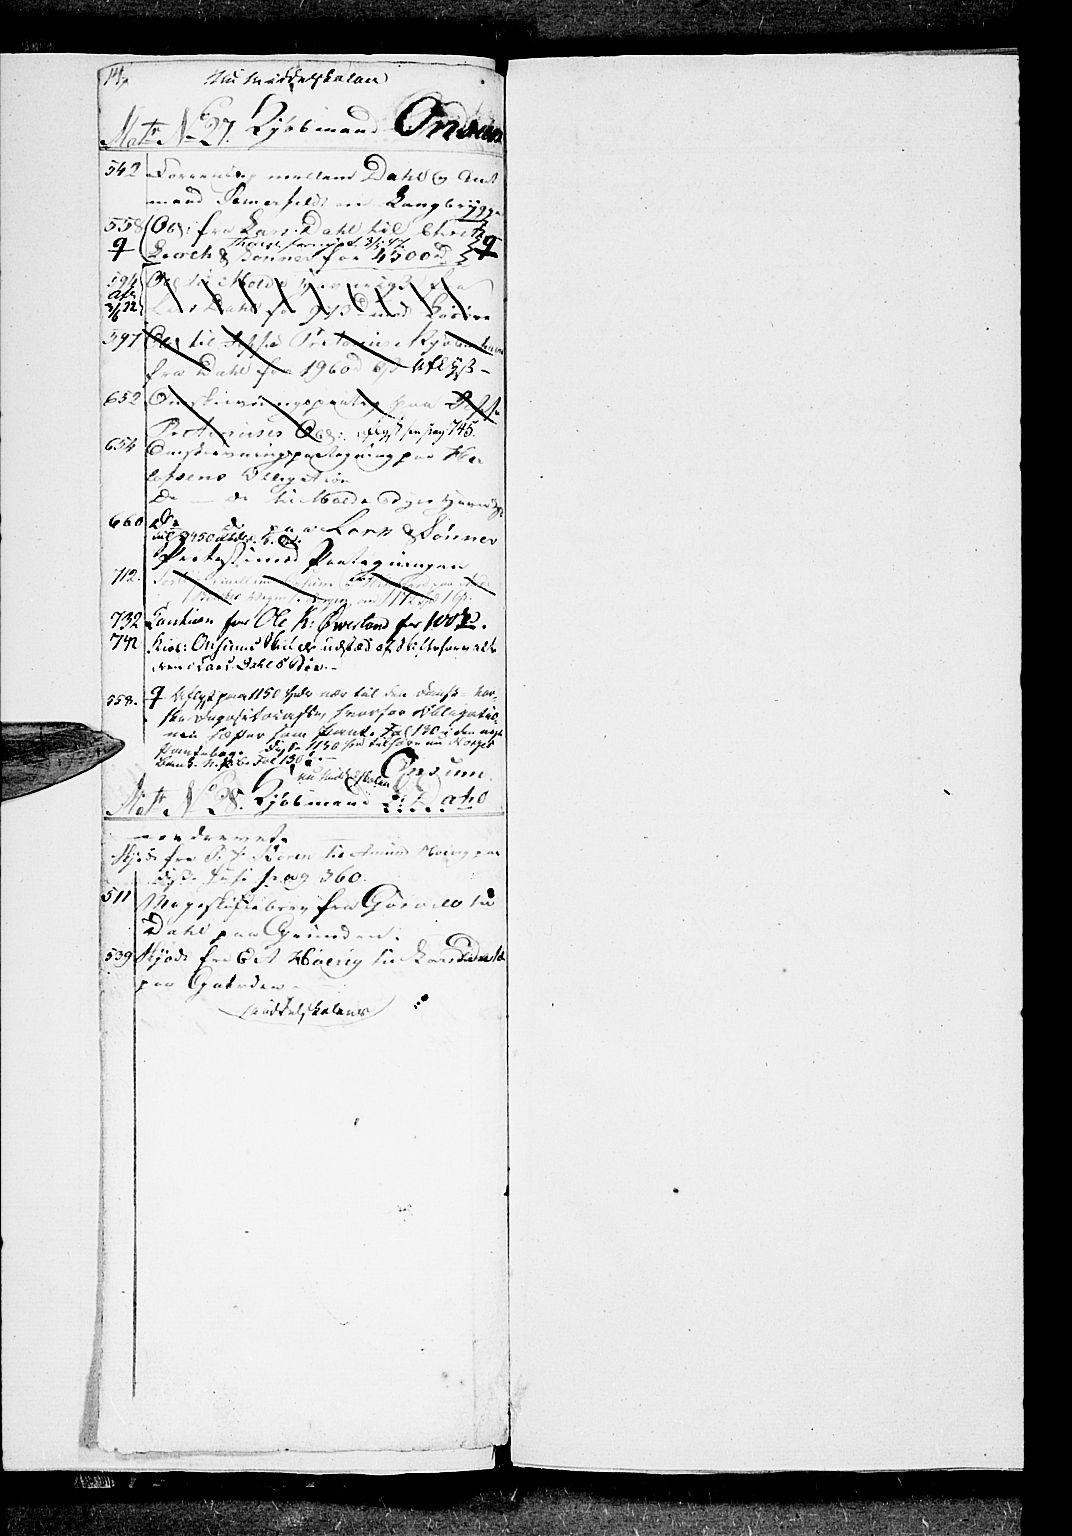 SAT, Molde byfogd, 2A/L0001: Panteregister nr. 1, 1790-1823, s. 14